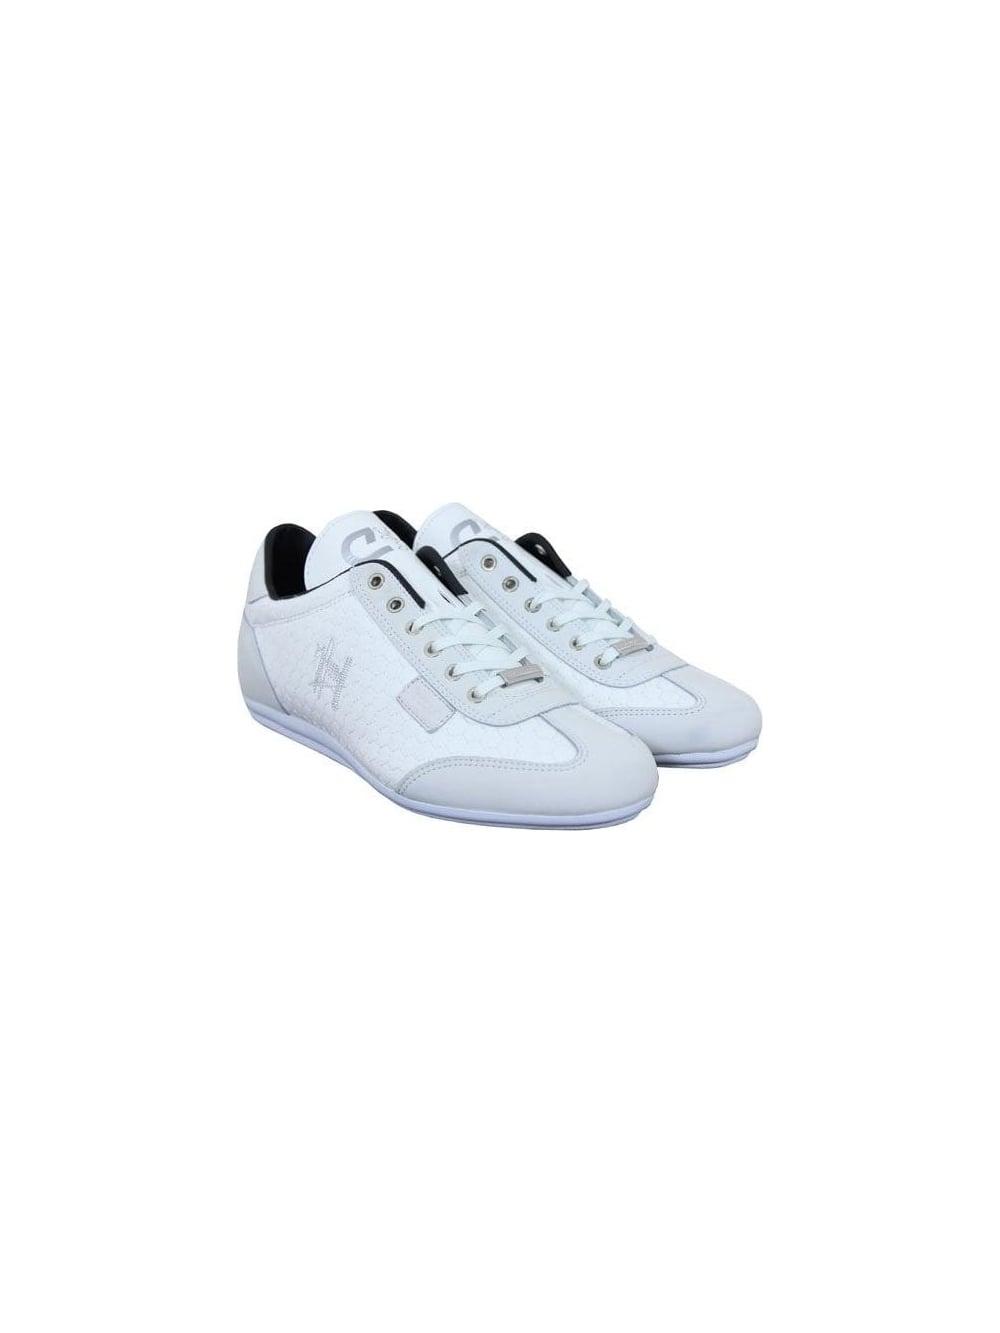 Cruyff Recopa Classic Trainers in White